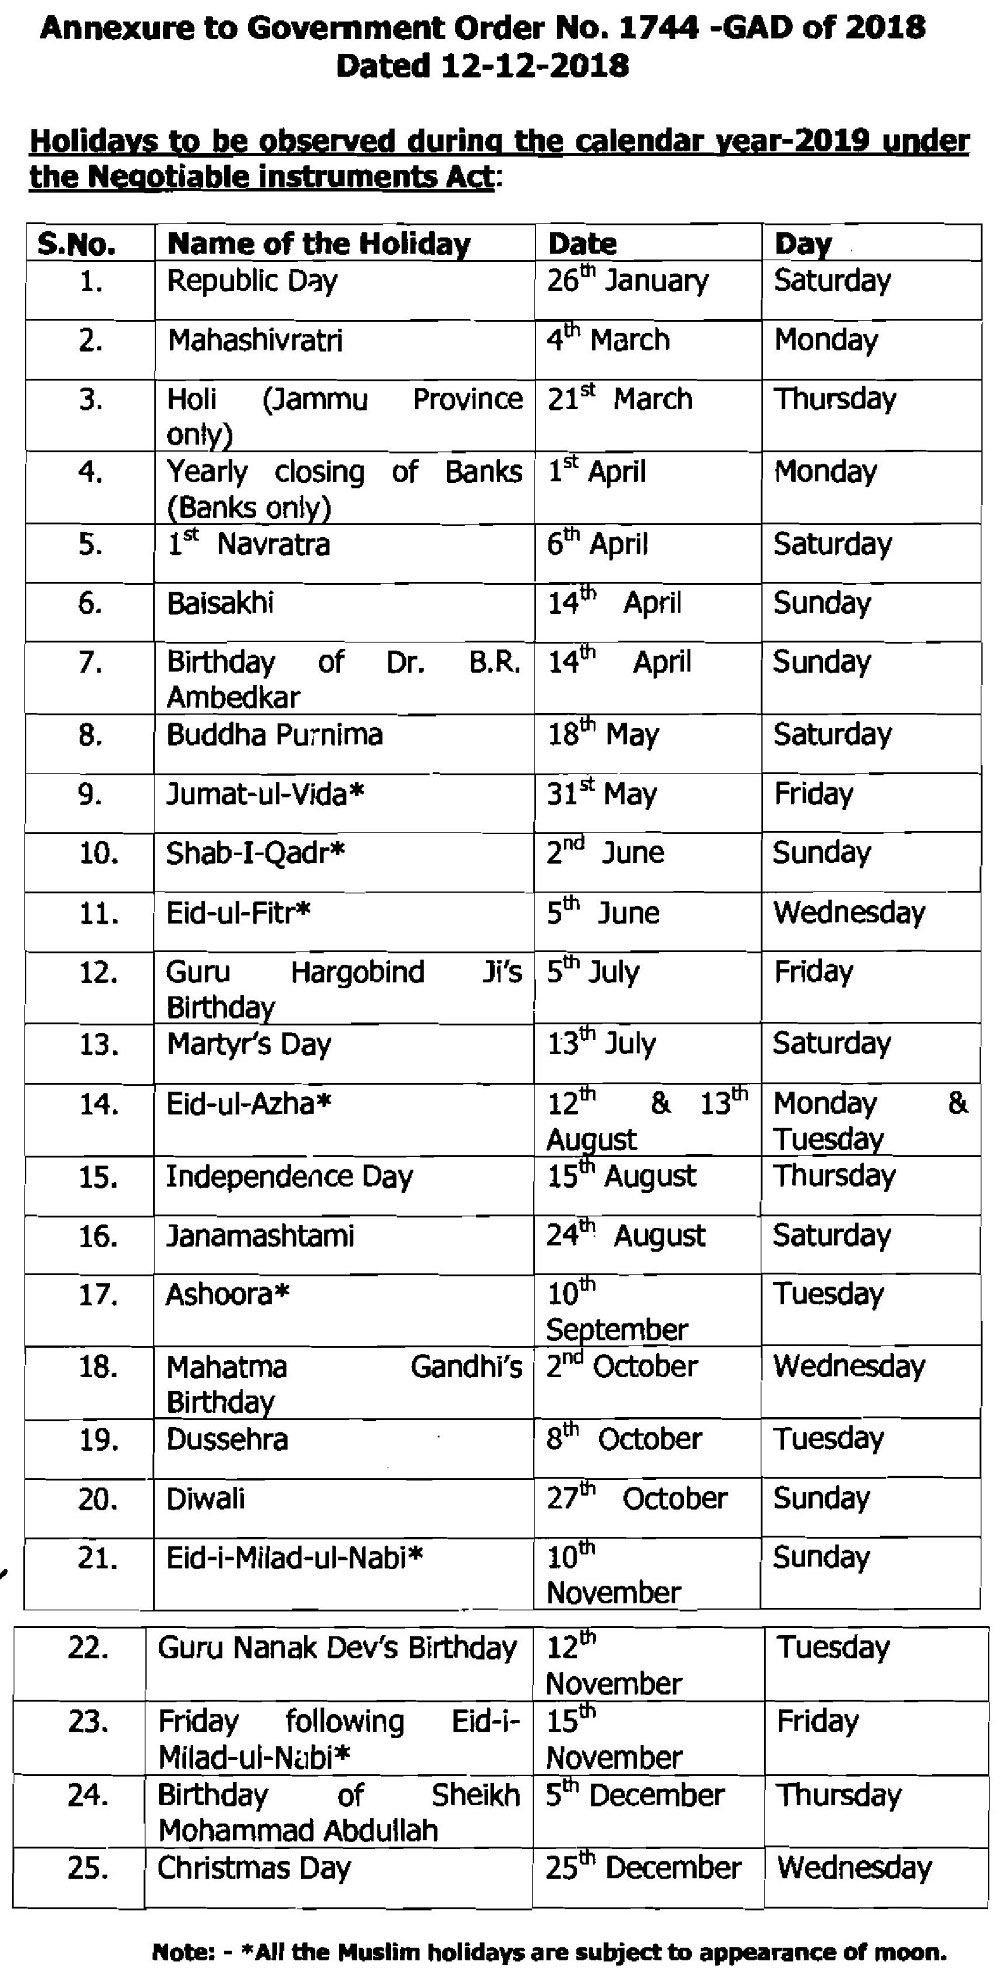 List Of Holidays In J&k For Calendar Year 2019   News & Updates J&k Calendar 2019